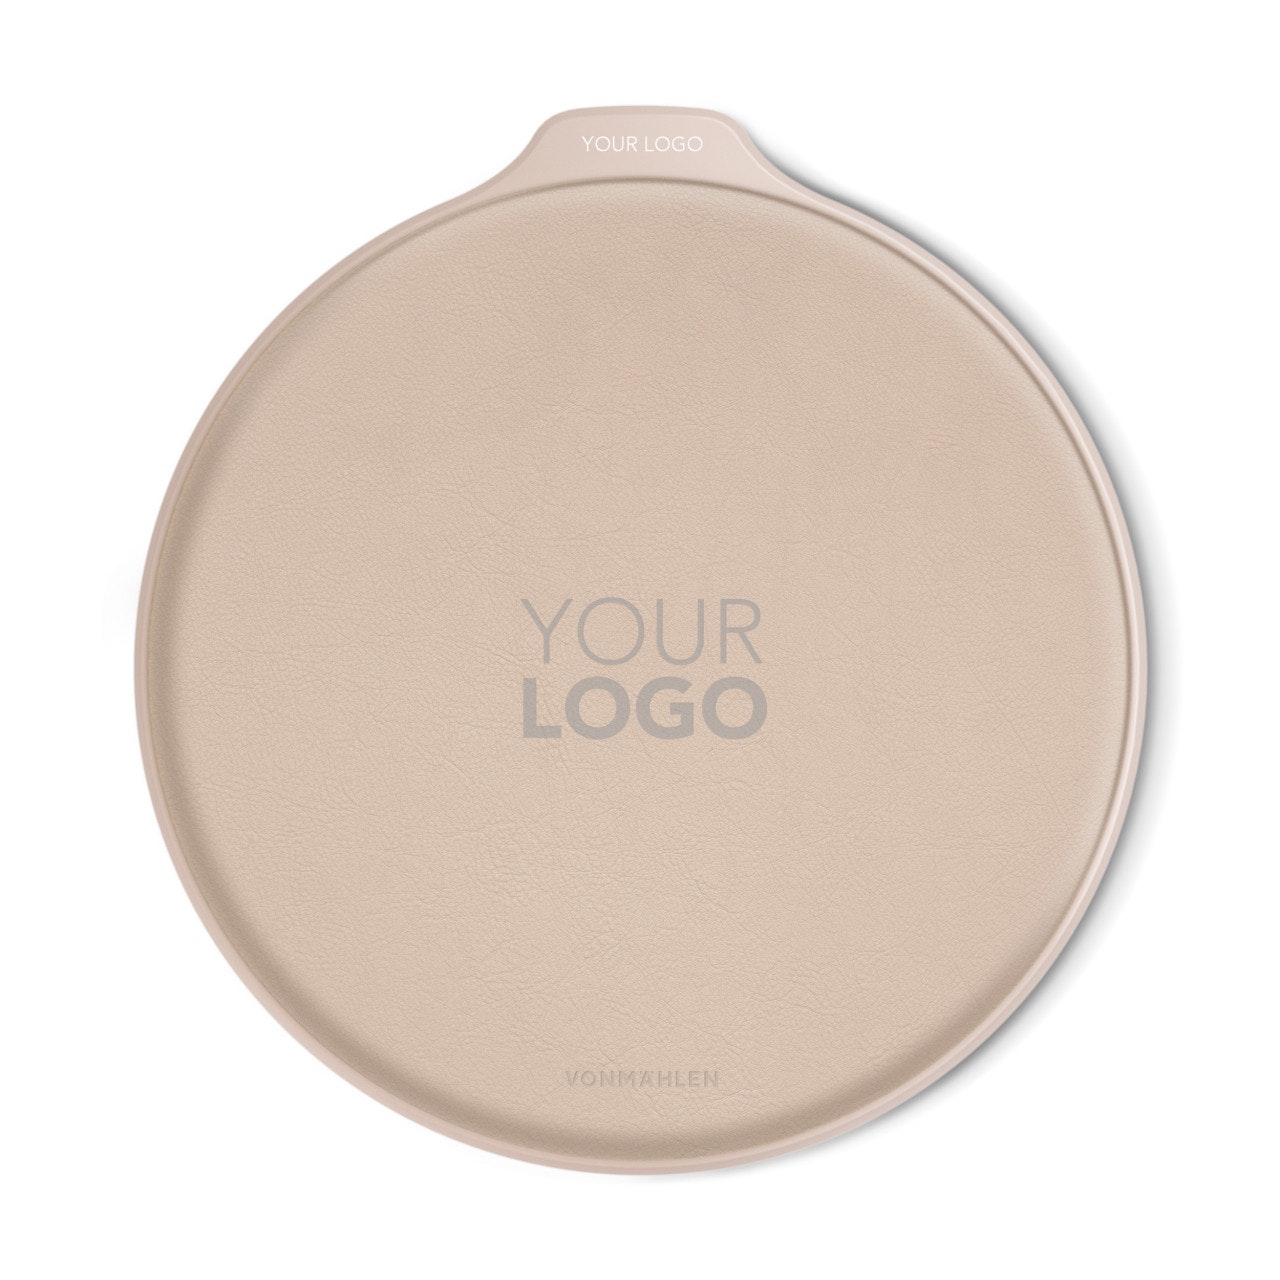 Aura - The Wireless Charging Pad